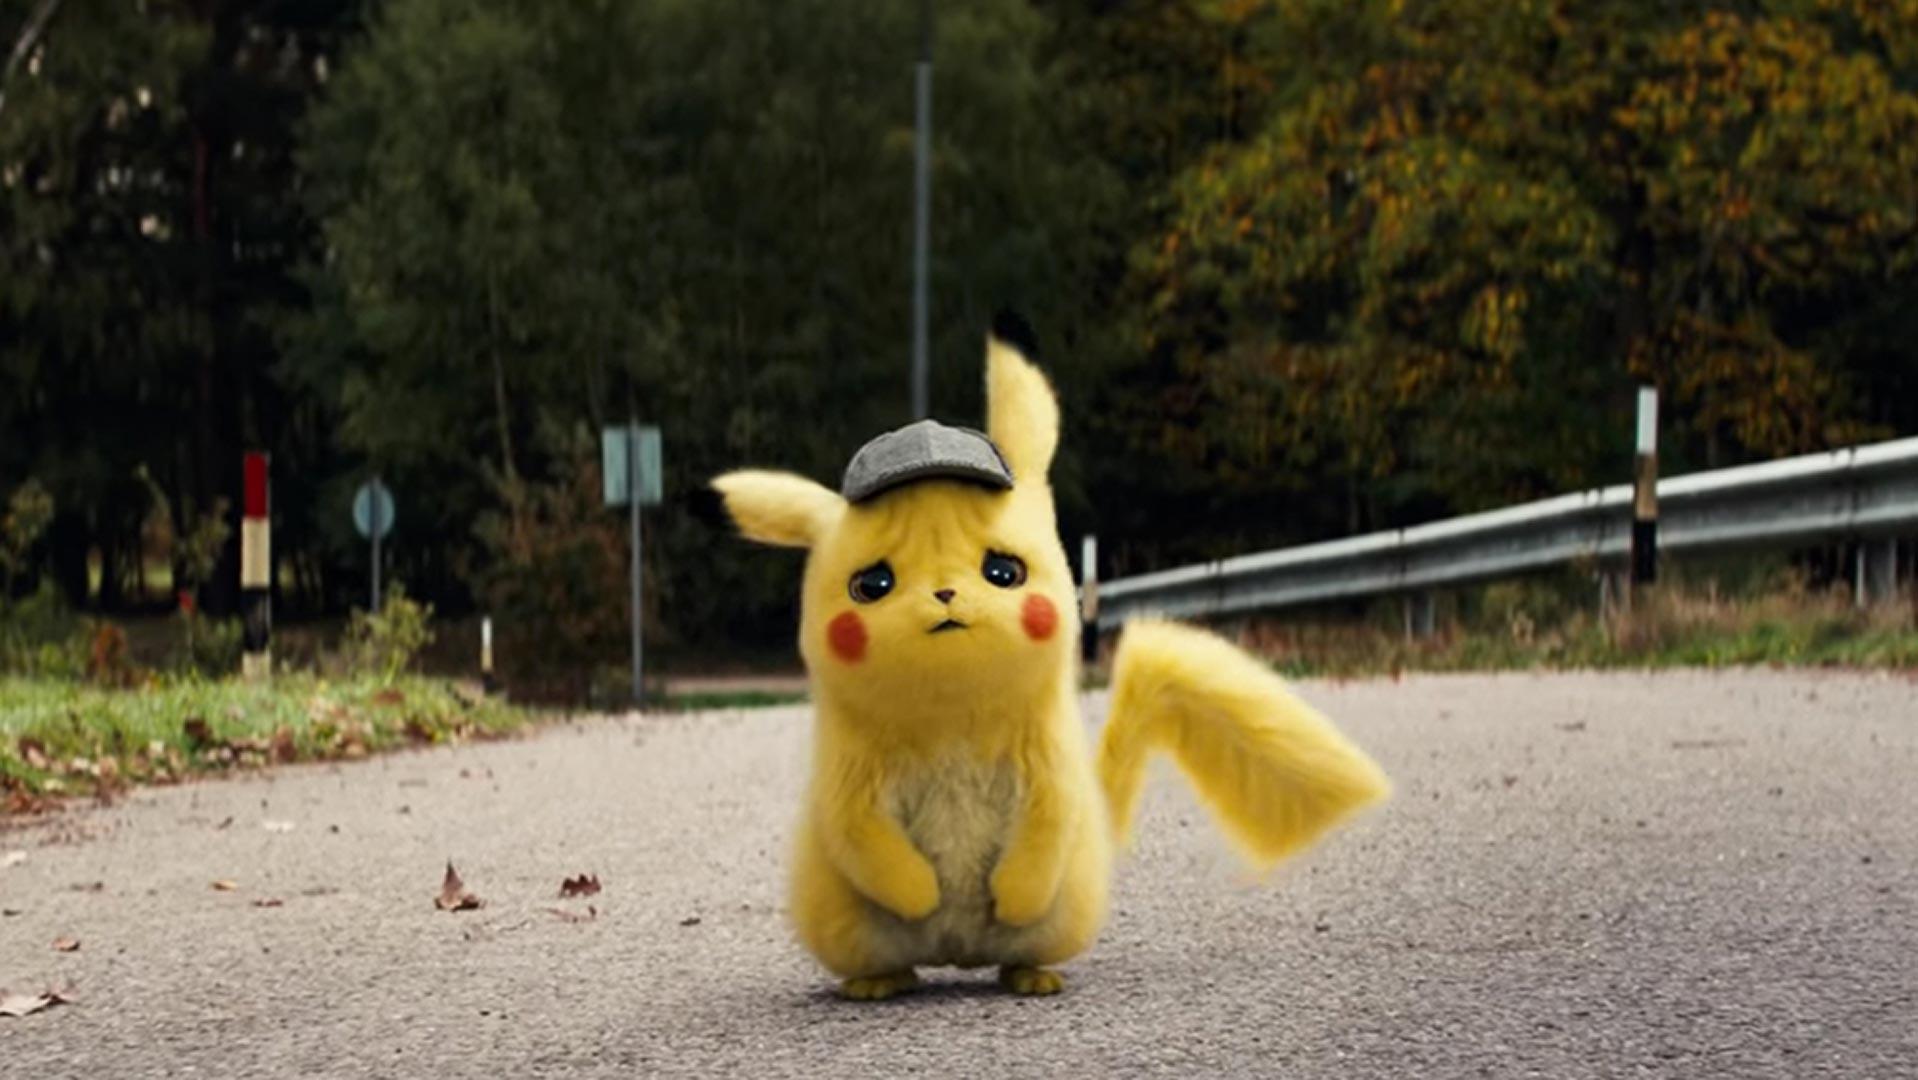 detective pikachu - review 03